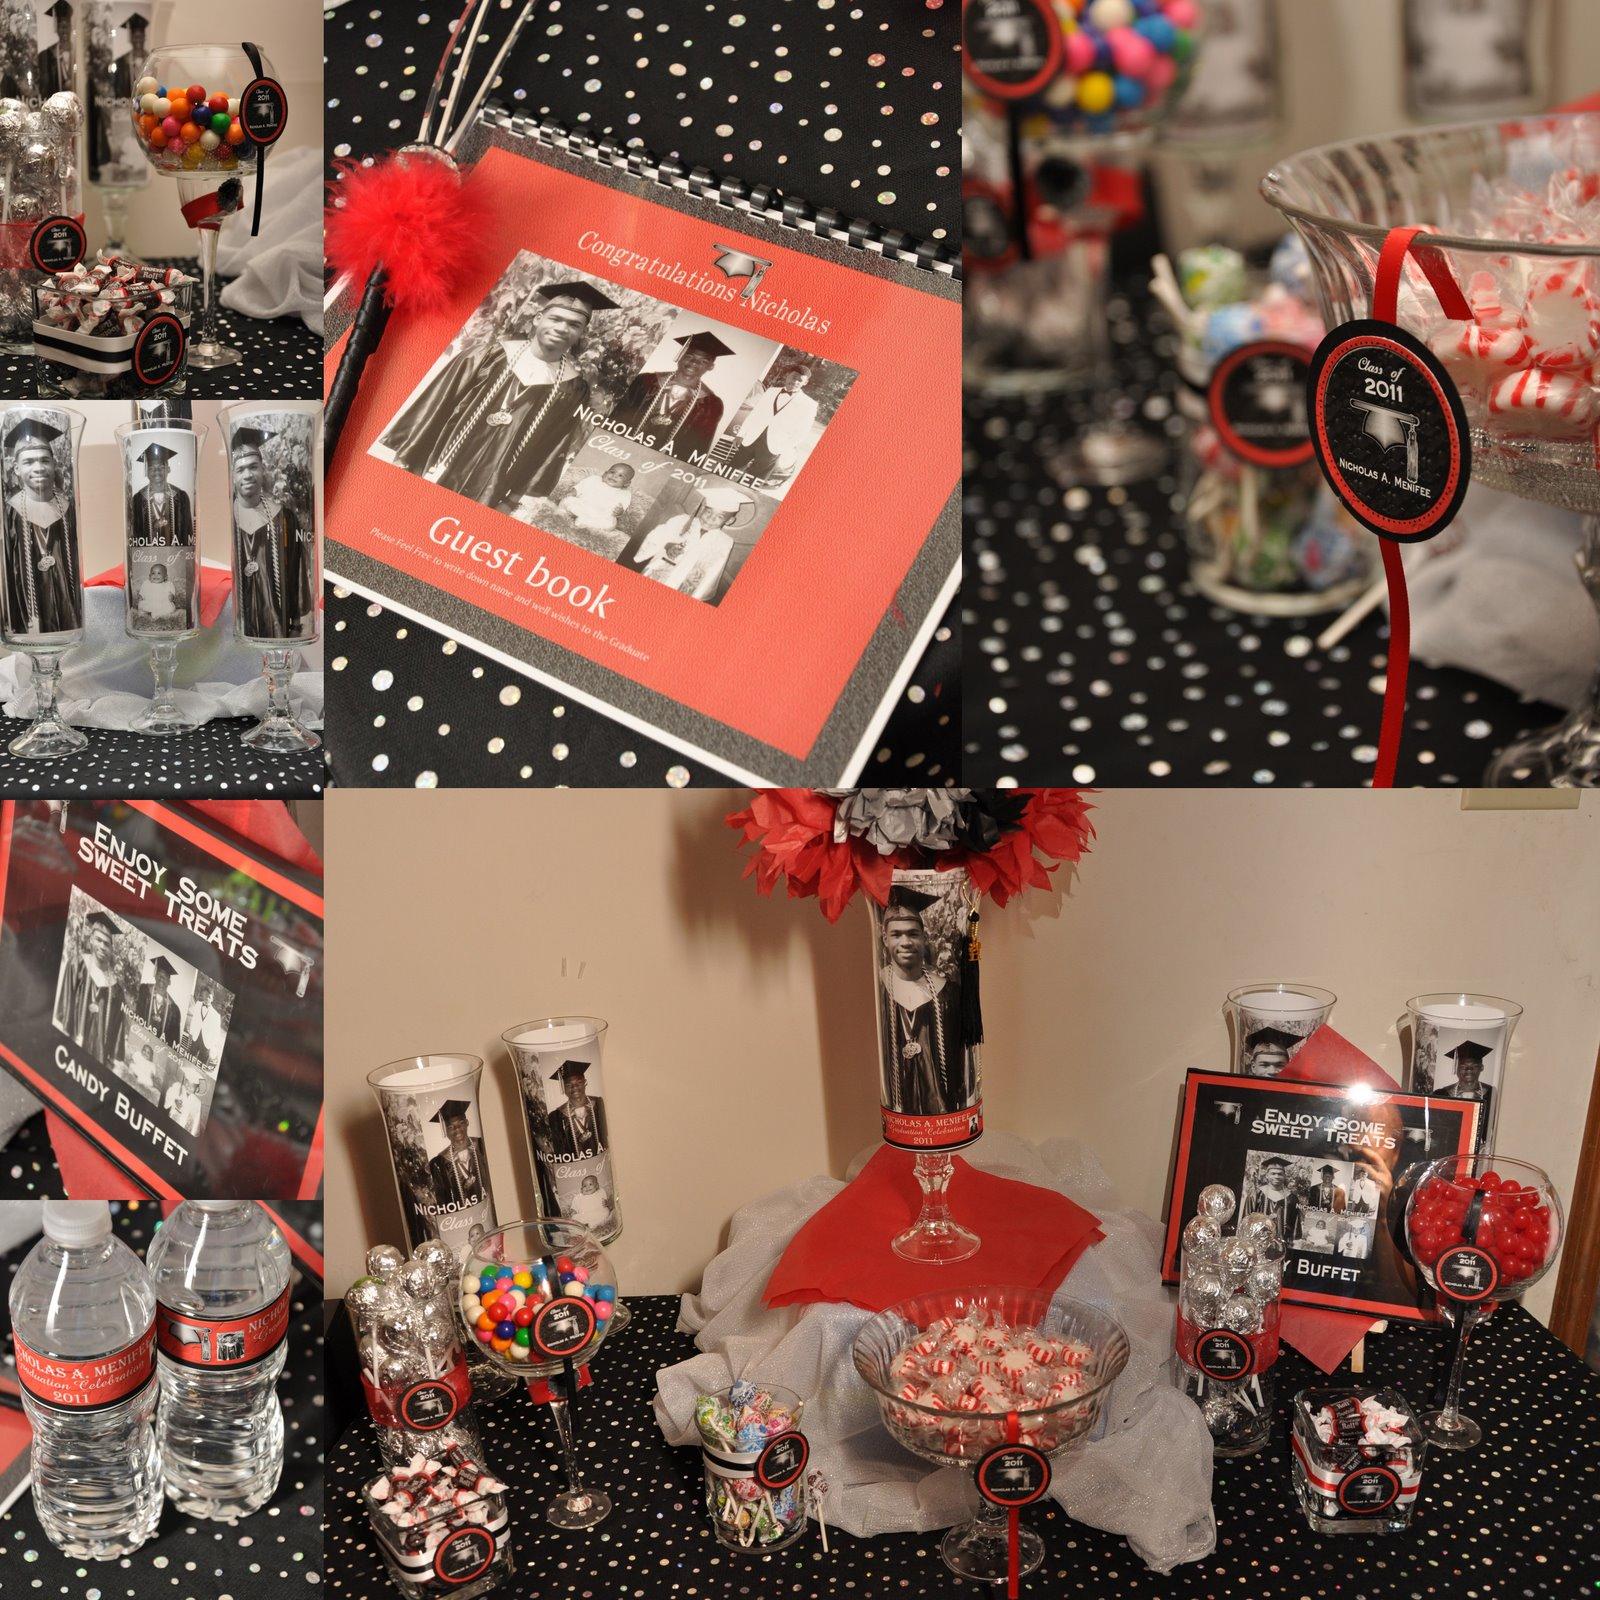 kustom kreations phtography celebration decor graduation decoration red black. Black Bedroom Furniture Sets. Home Design Ideas